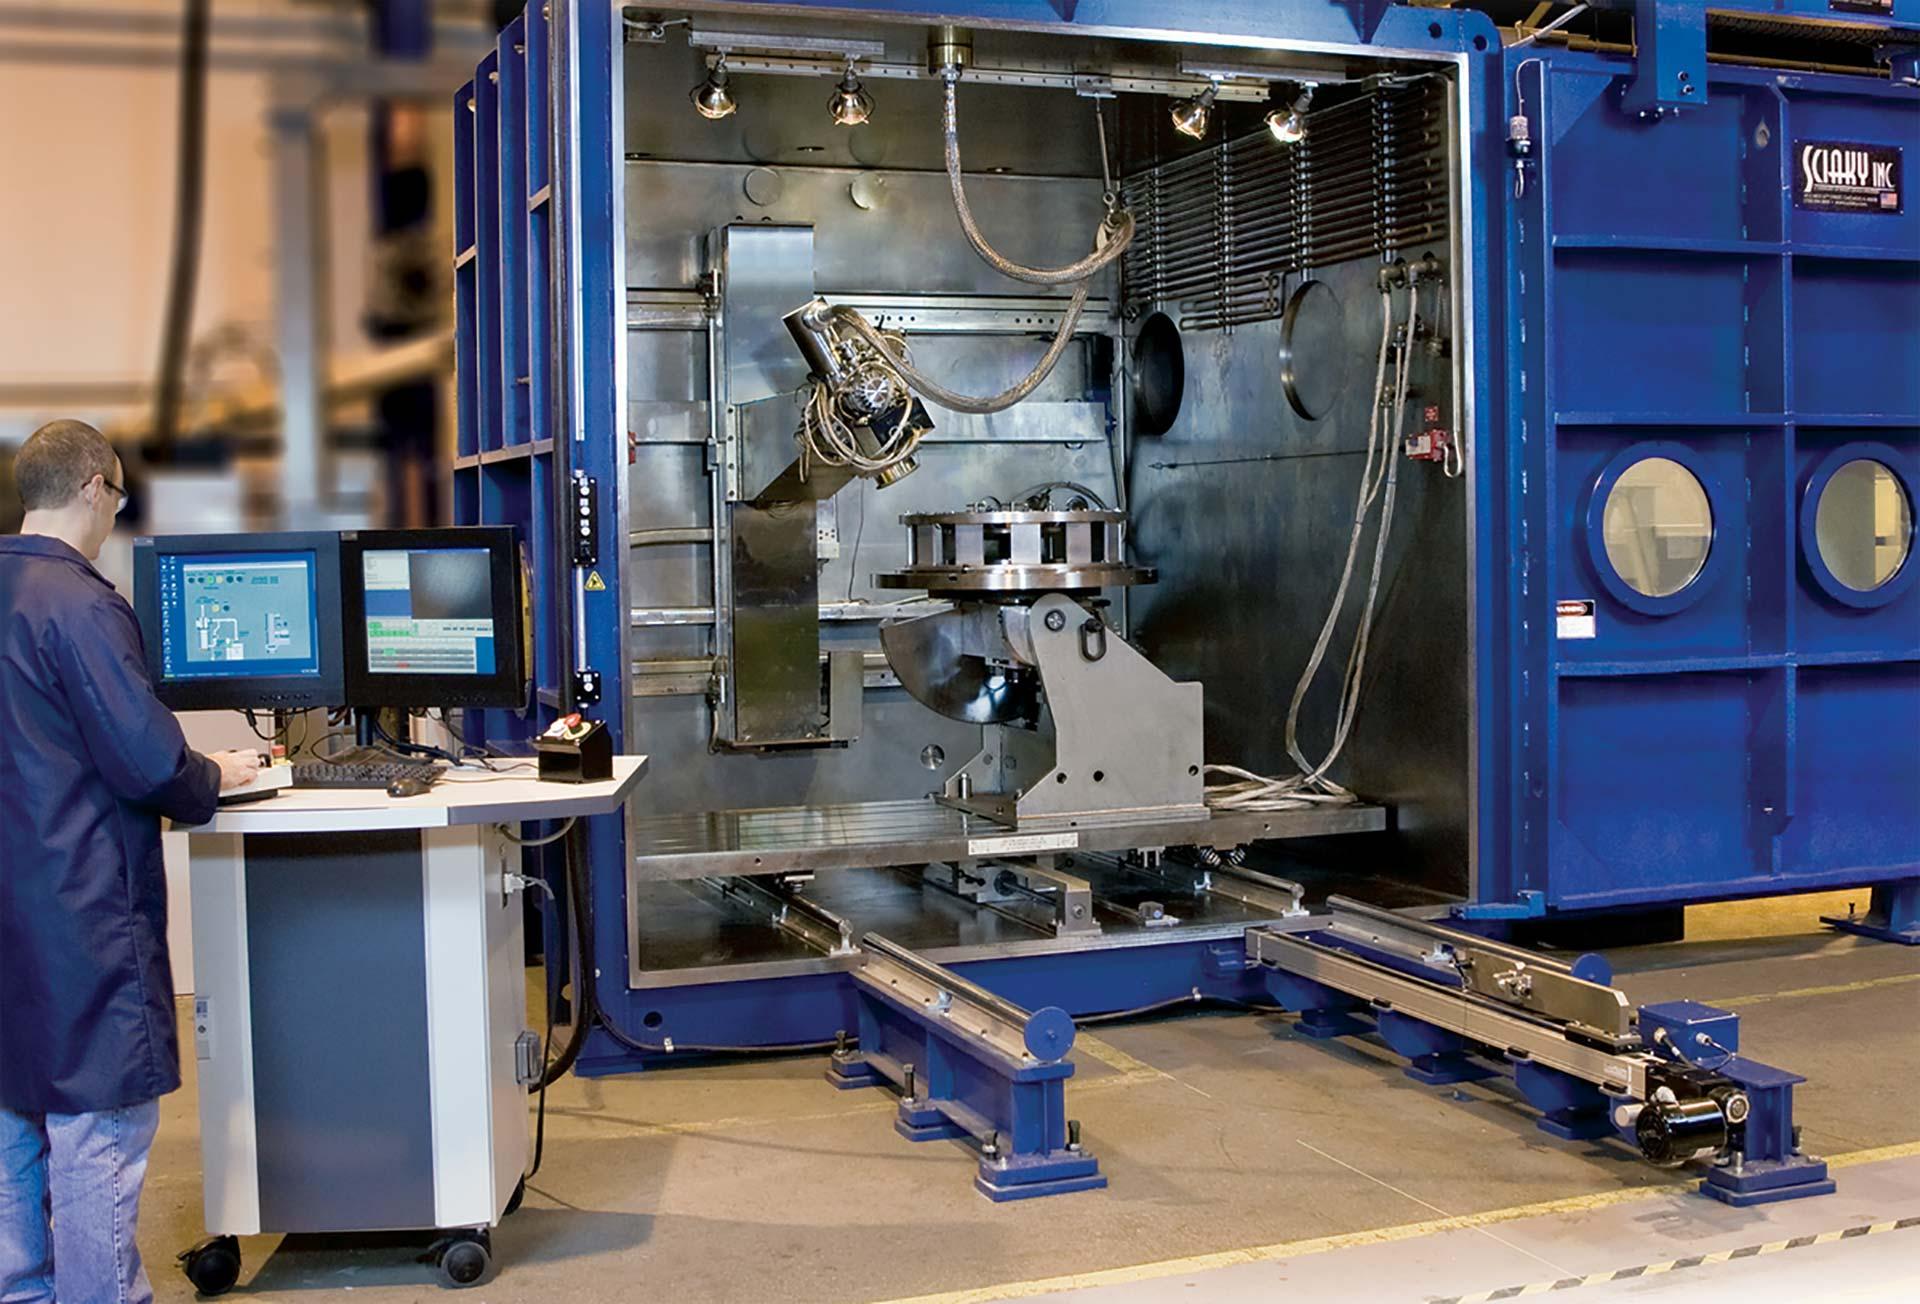 Sciakys-110-EBAM-metal-3D-printer